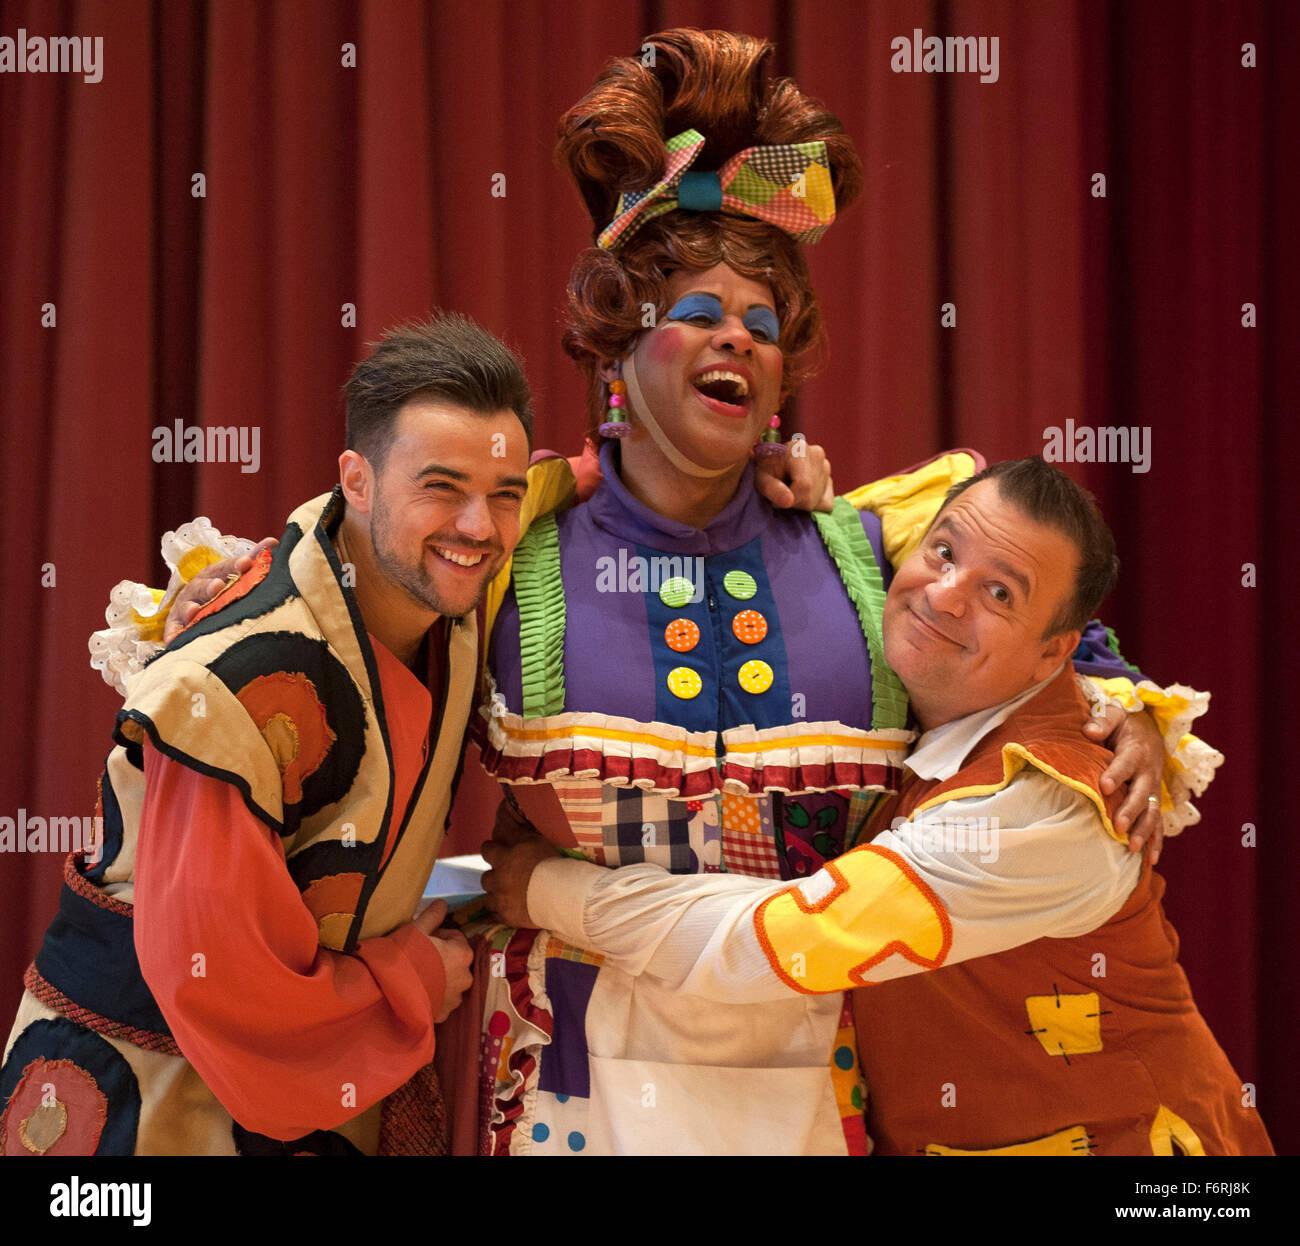 Ben Adams Gary Wilmot Kev Orkian Pose During A Photocall For Aladdin At Milton Keynes Theatre On November 18 2015 In Milton Keynes England